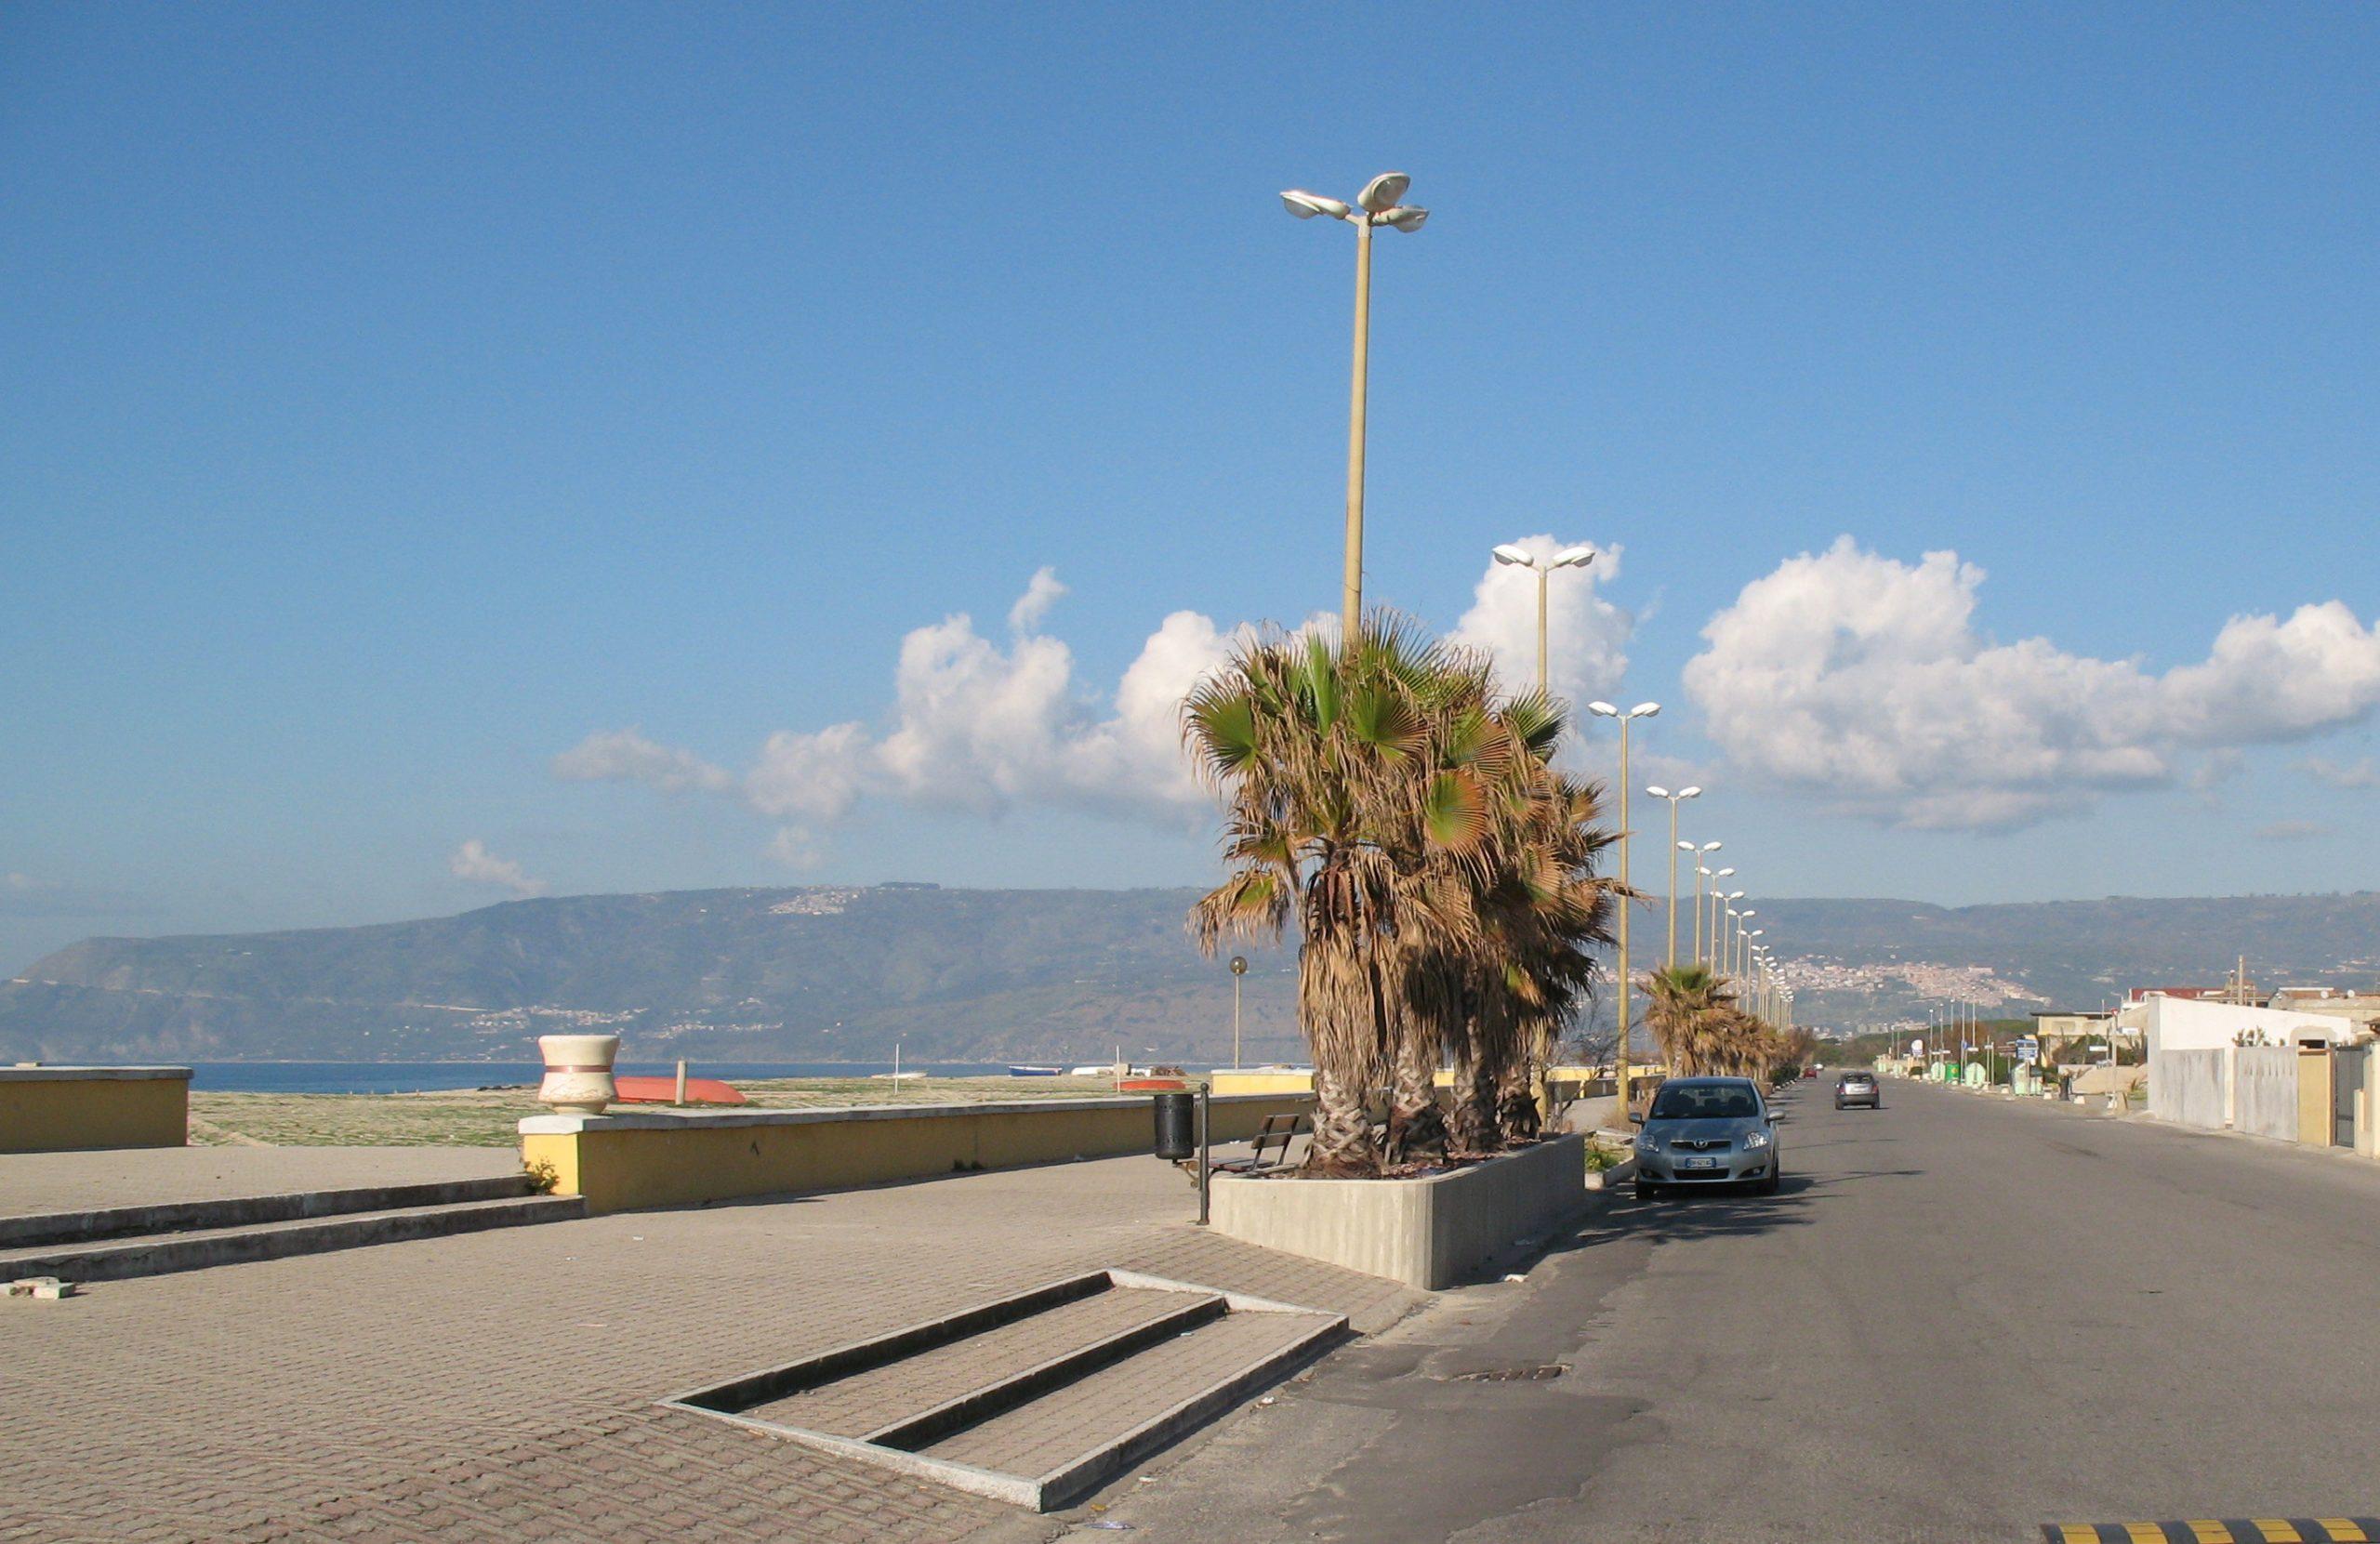 San_Ferdinando_(RC)_-_Viale_Autonomia_(lungomare)02